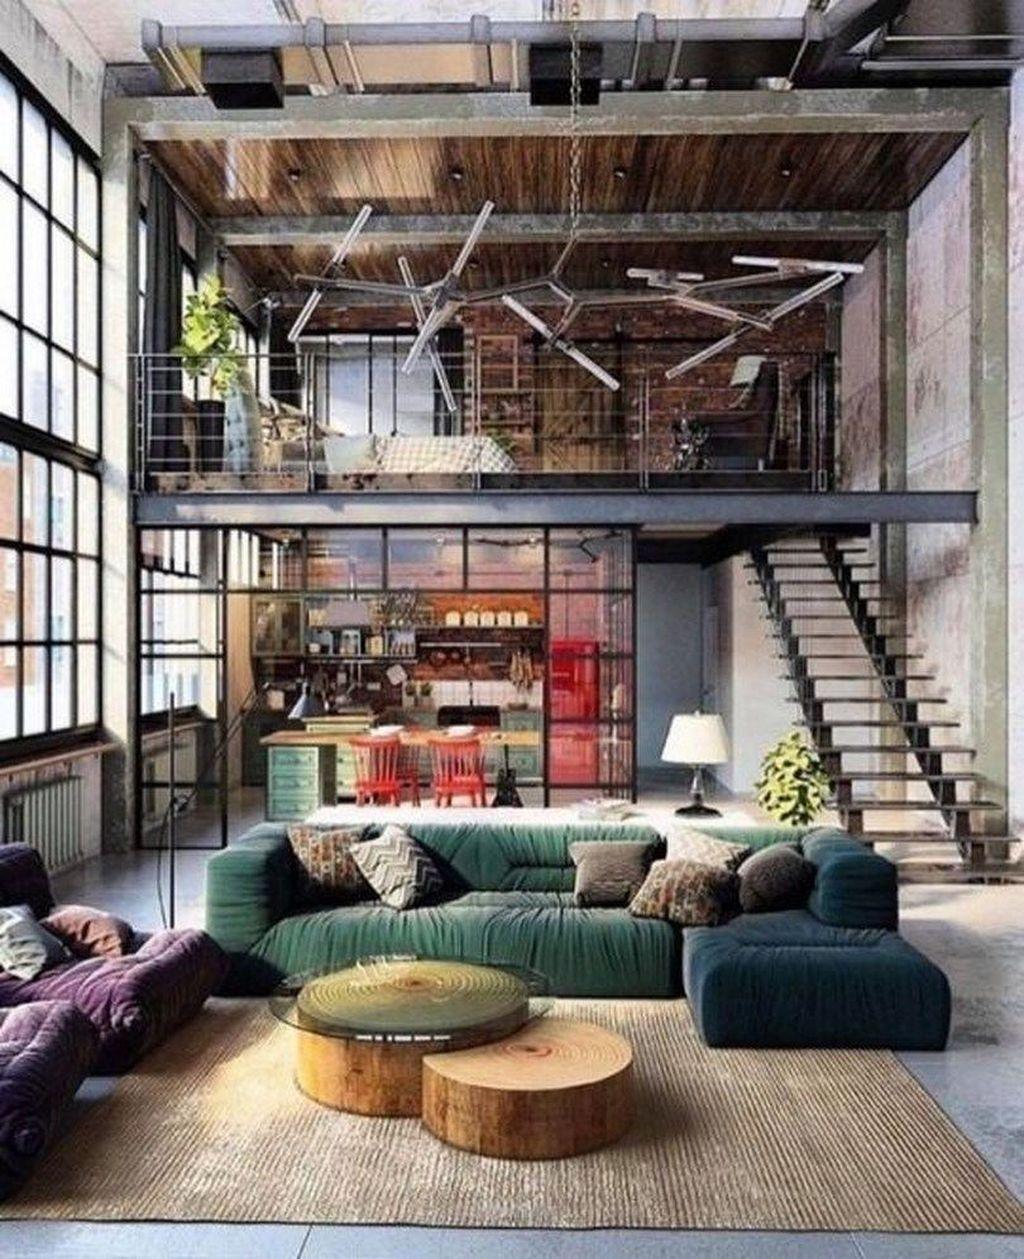 32 Stunning Loft Apartment Decorating Ideas You Should Try In 2020 Loft Apartment Decorating Loft Design Industrial Interior Design